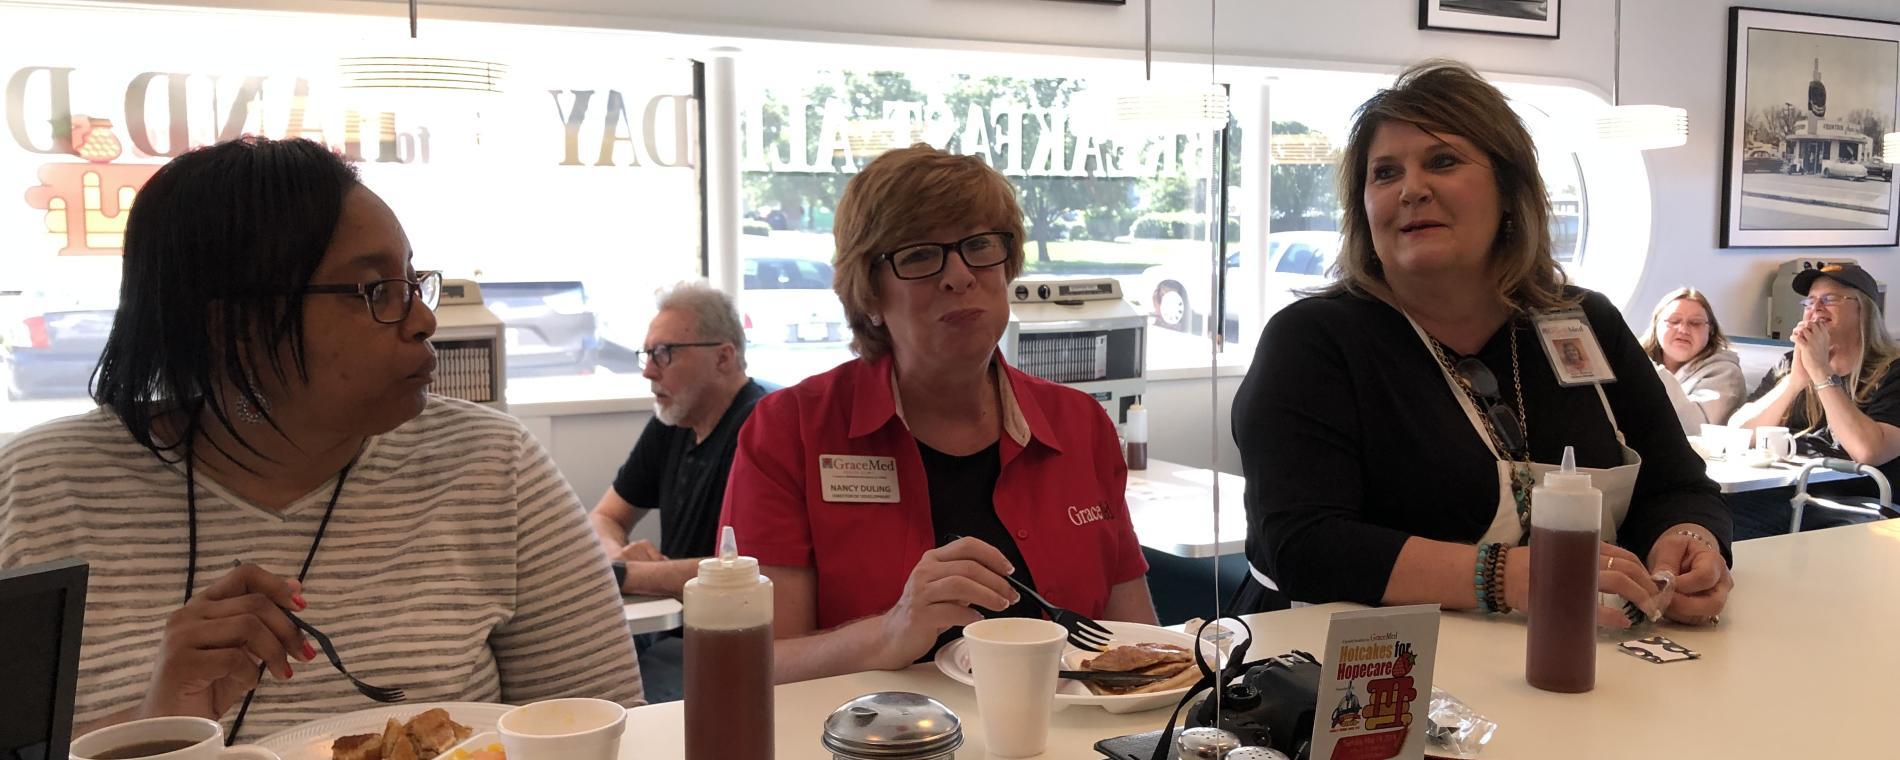 North-ladies at counter Visit Wichita